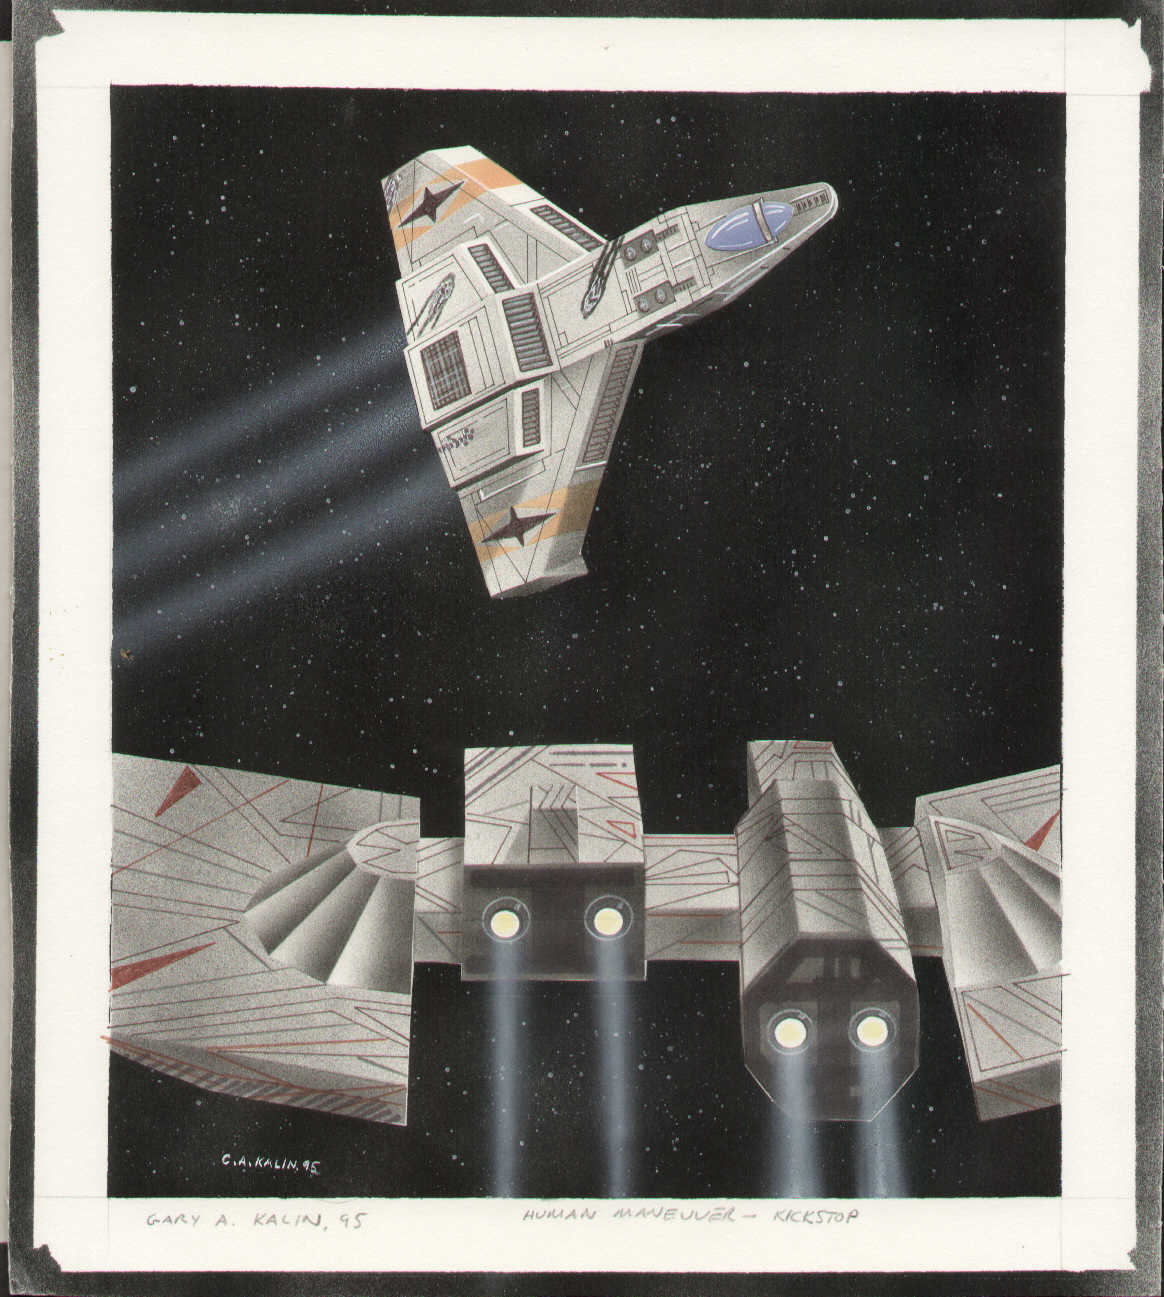 Wing Commander Human Maneuver Kickstop.jpg